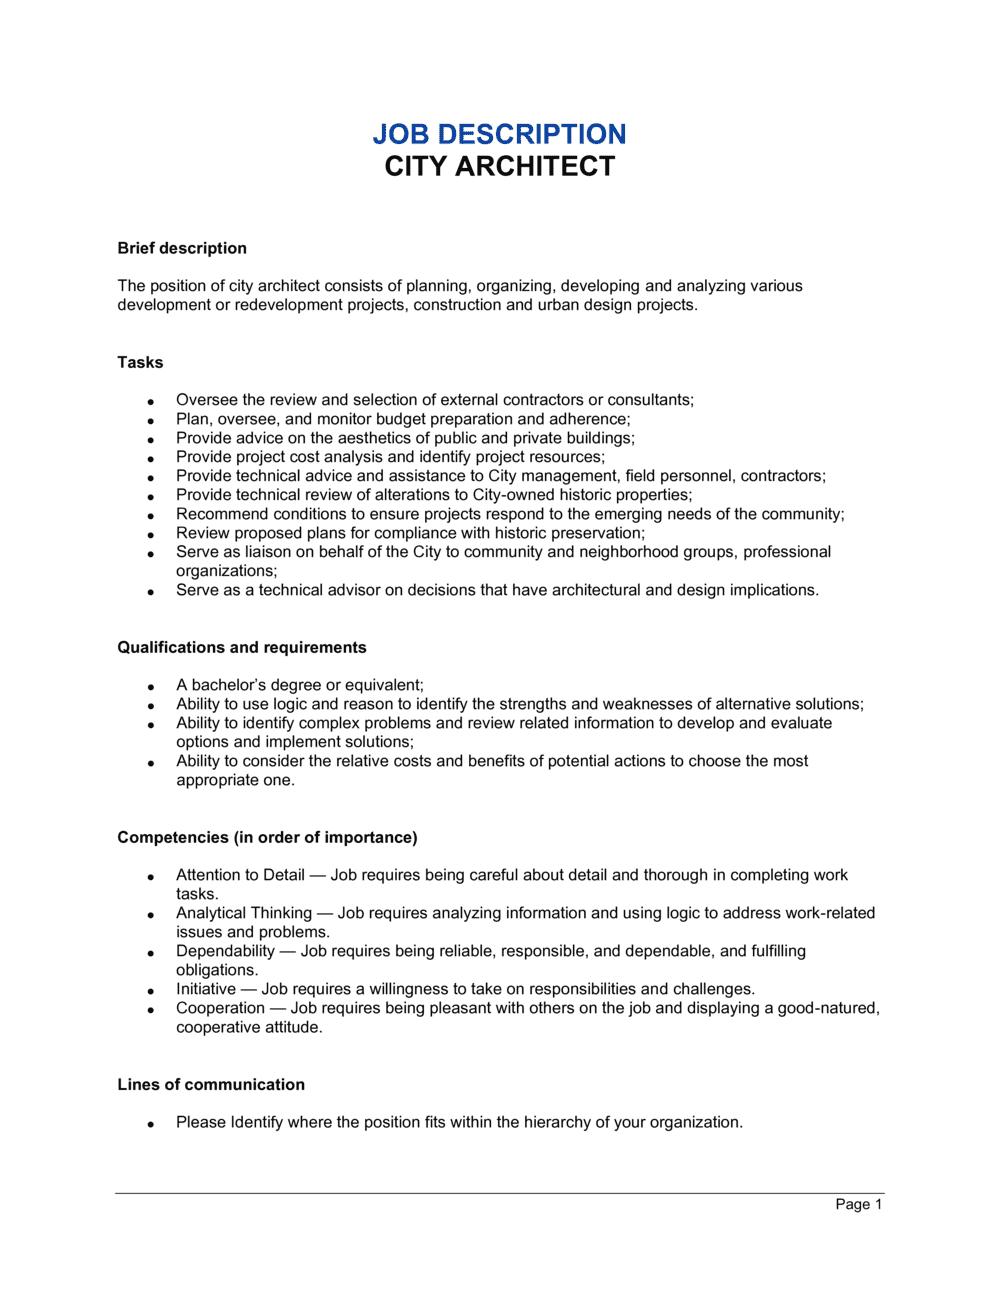 Business-in-a-Box's City Architect Job Description Template